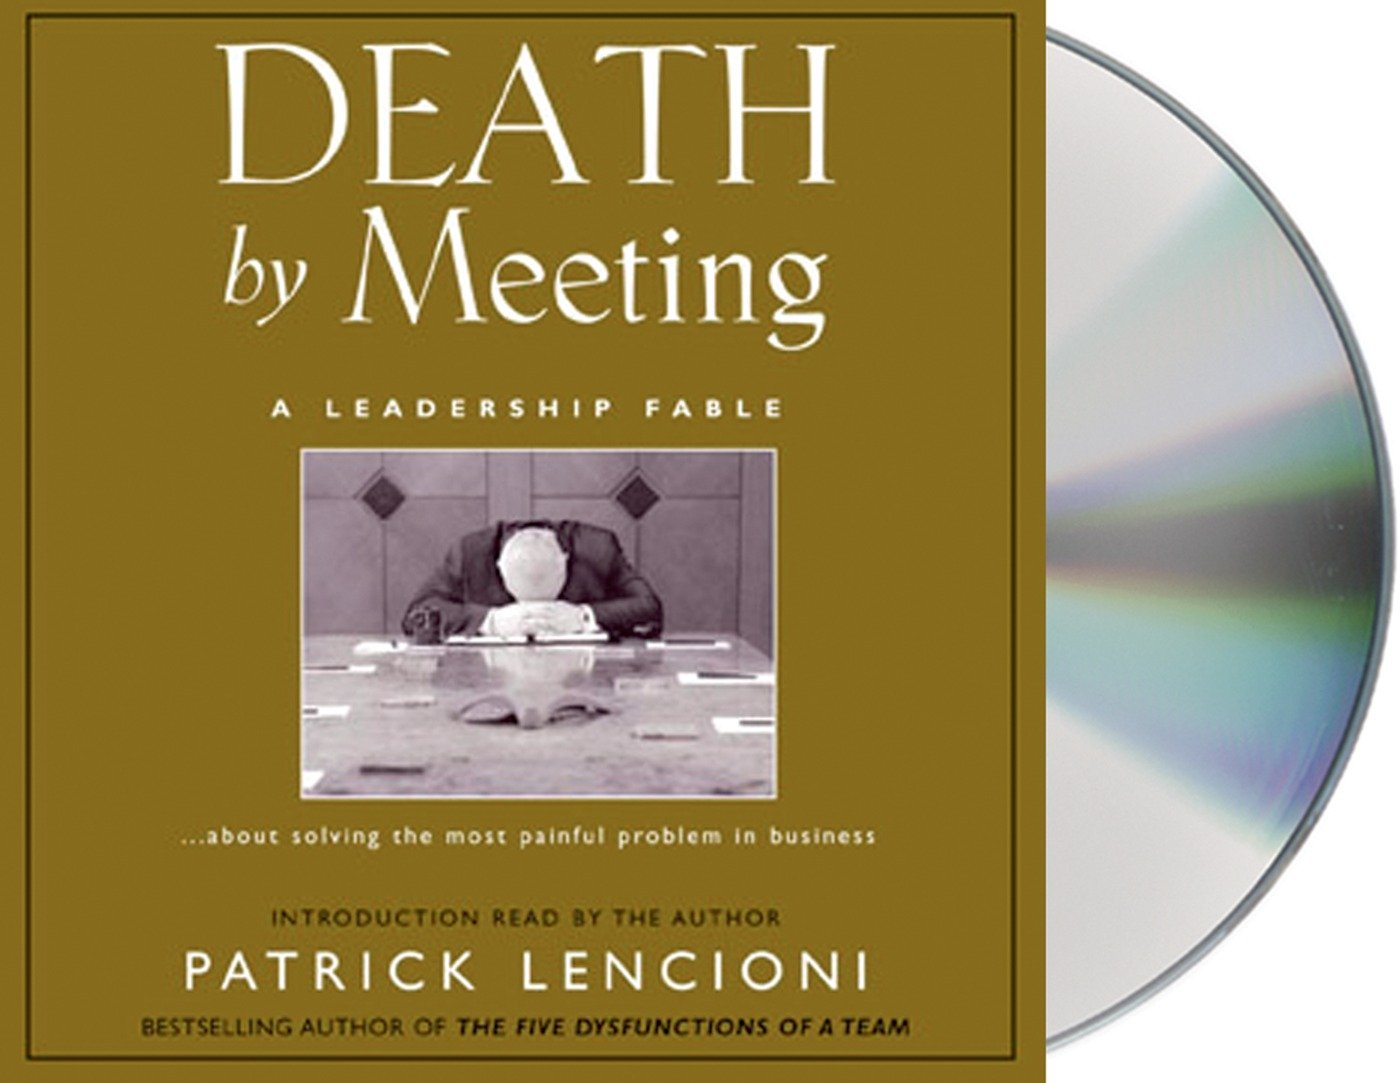 Death by Meeting: A Leadership Fable About Solving the Most Painful Problem  in Business: Amazon.de: Patrick Lencioni: Fremdsprachige Bücher